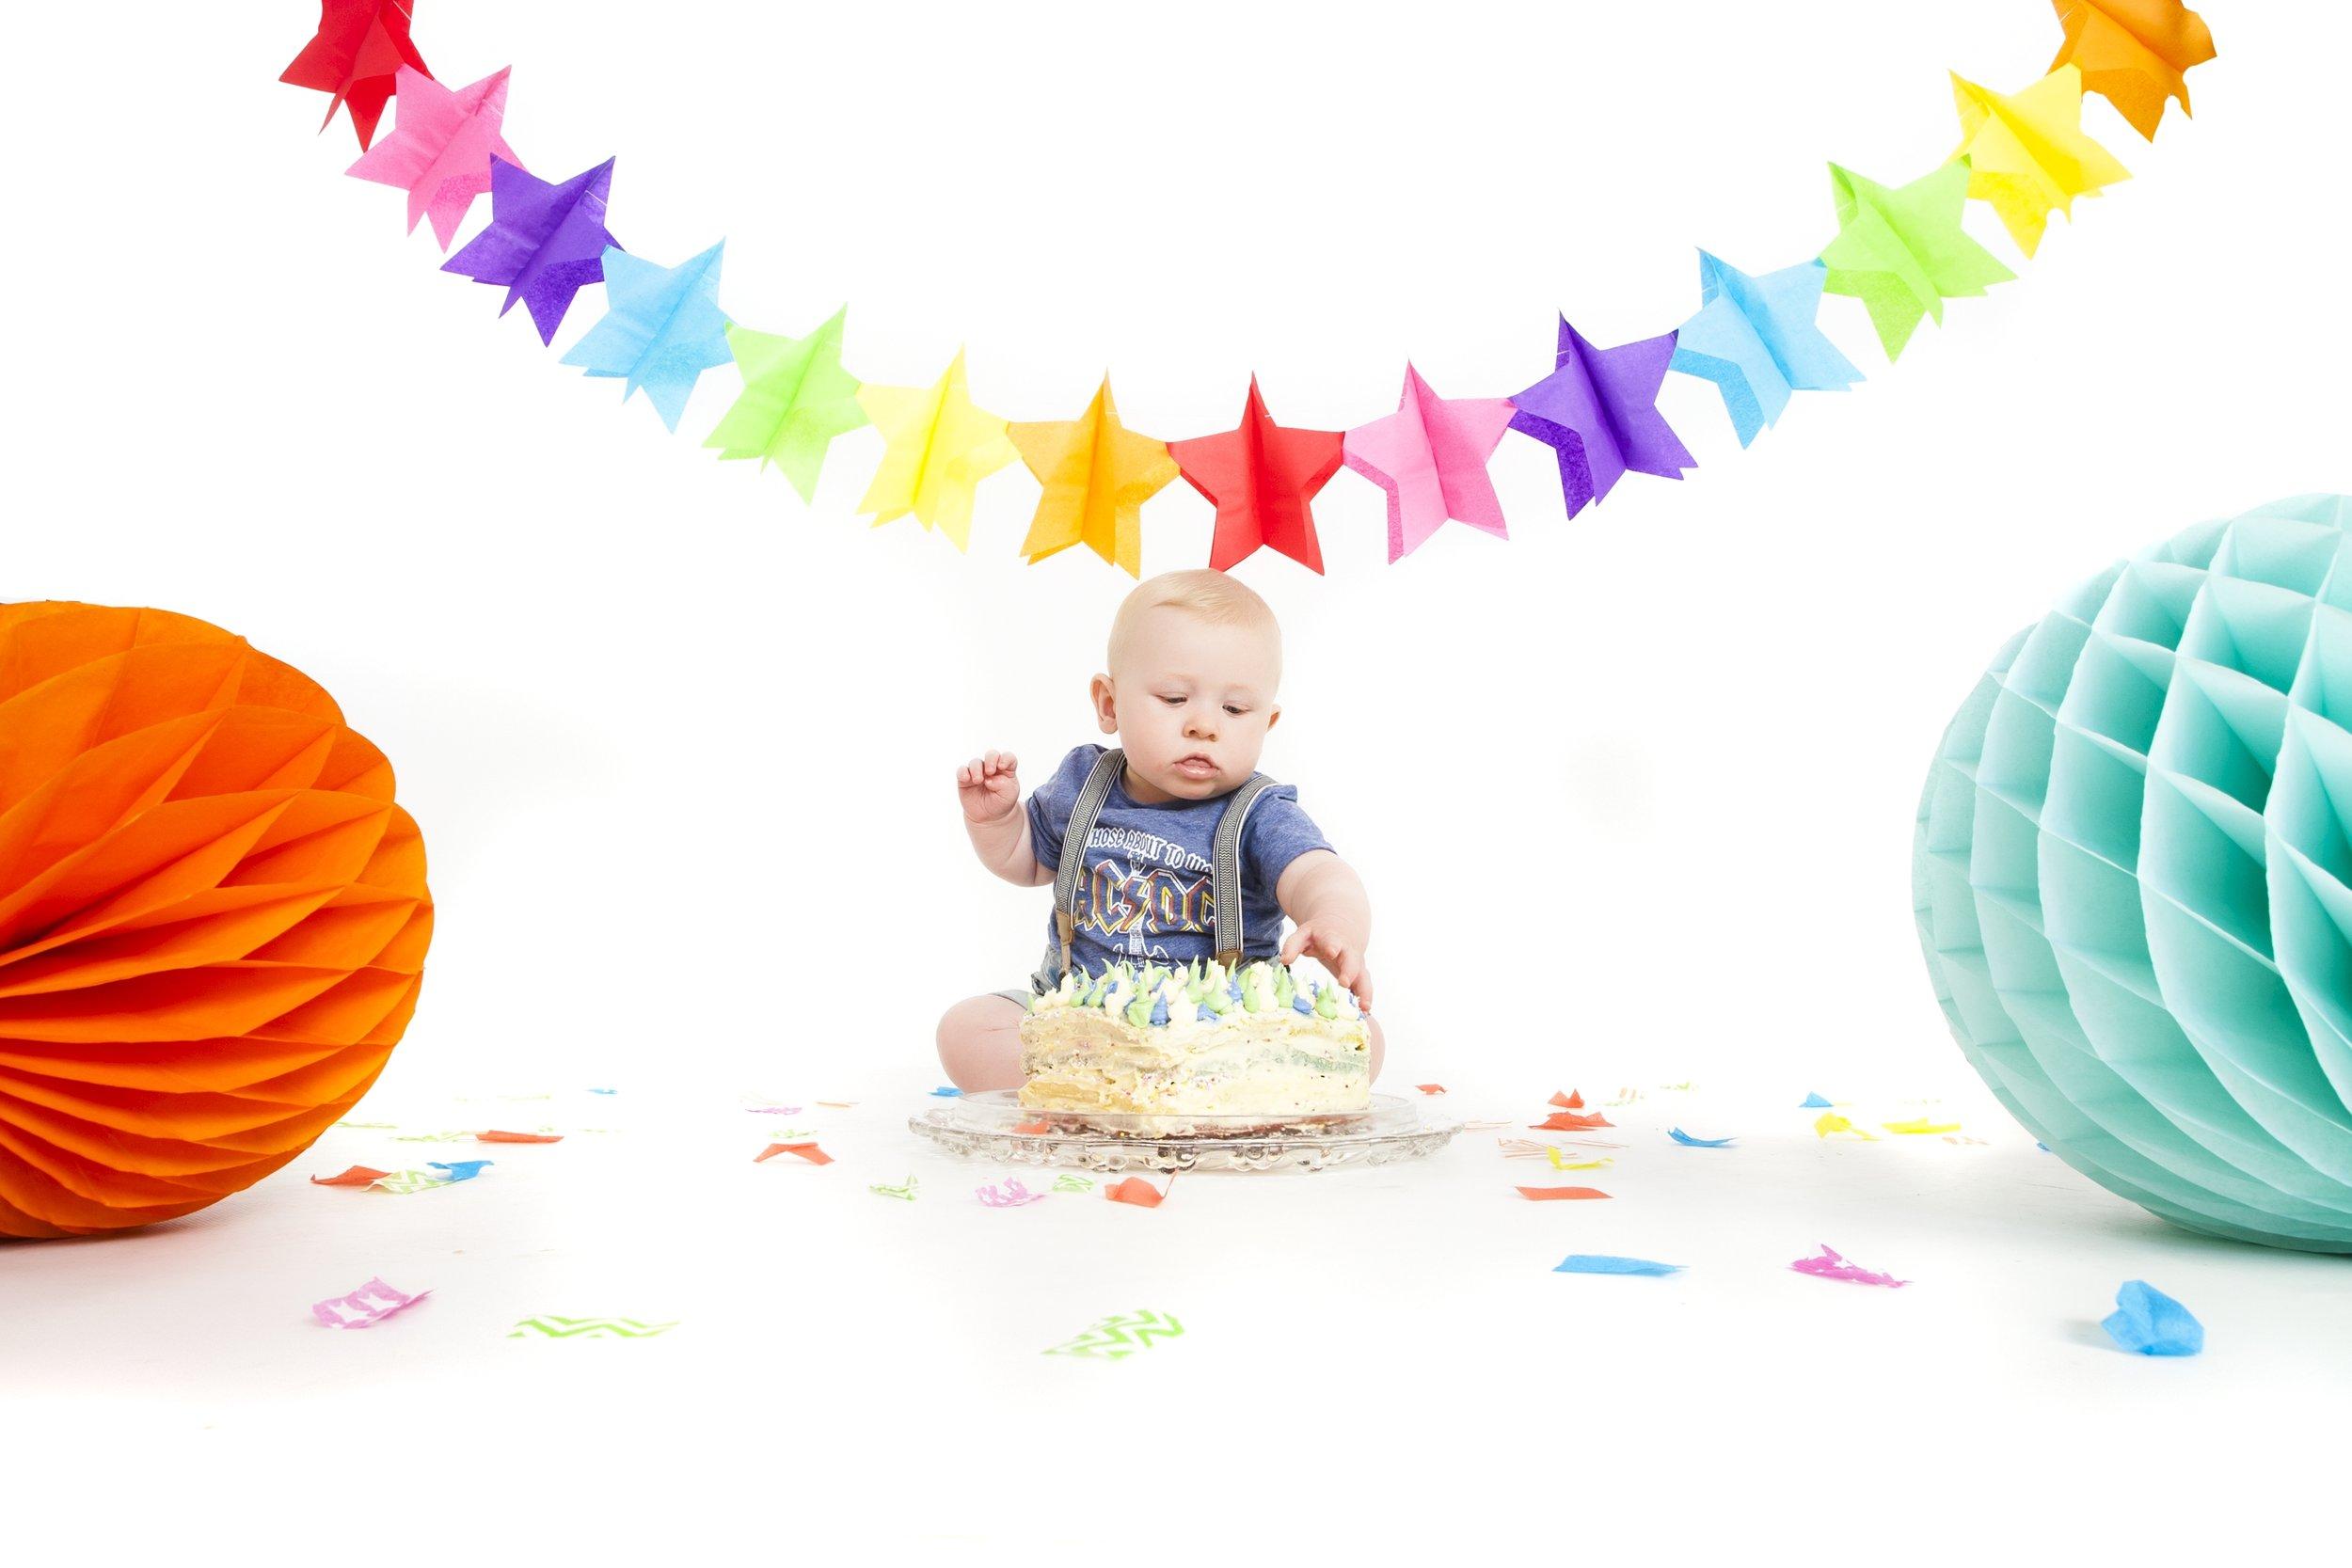 photography-studio-leicester-photo-shoot-photographer-baby-cakesmash-cake-smash-birthday-first-zigzag-zig-zag-family-clarendon-park-photographer-queens-road-ideas-props.jpg